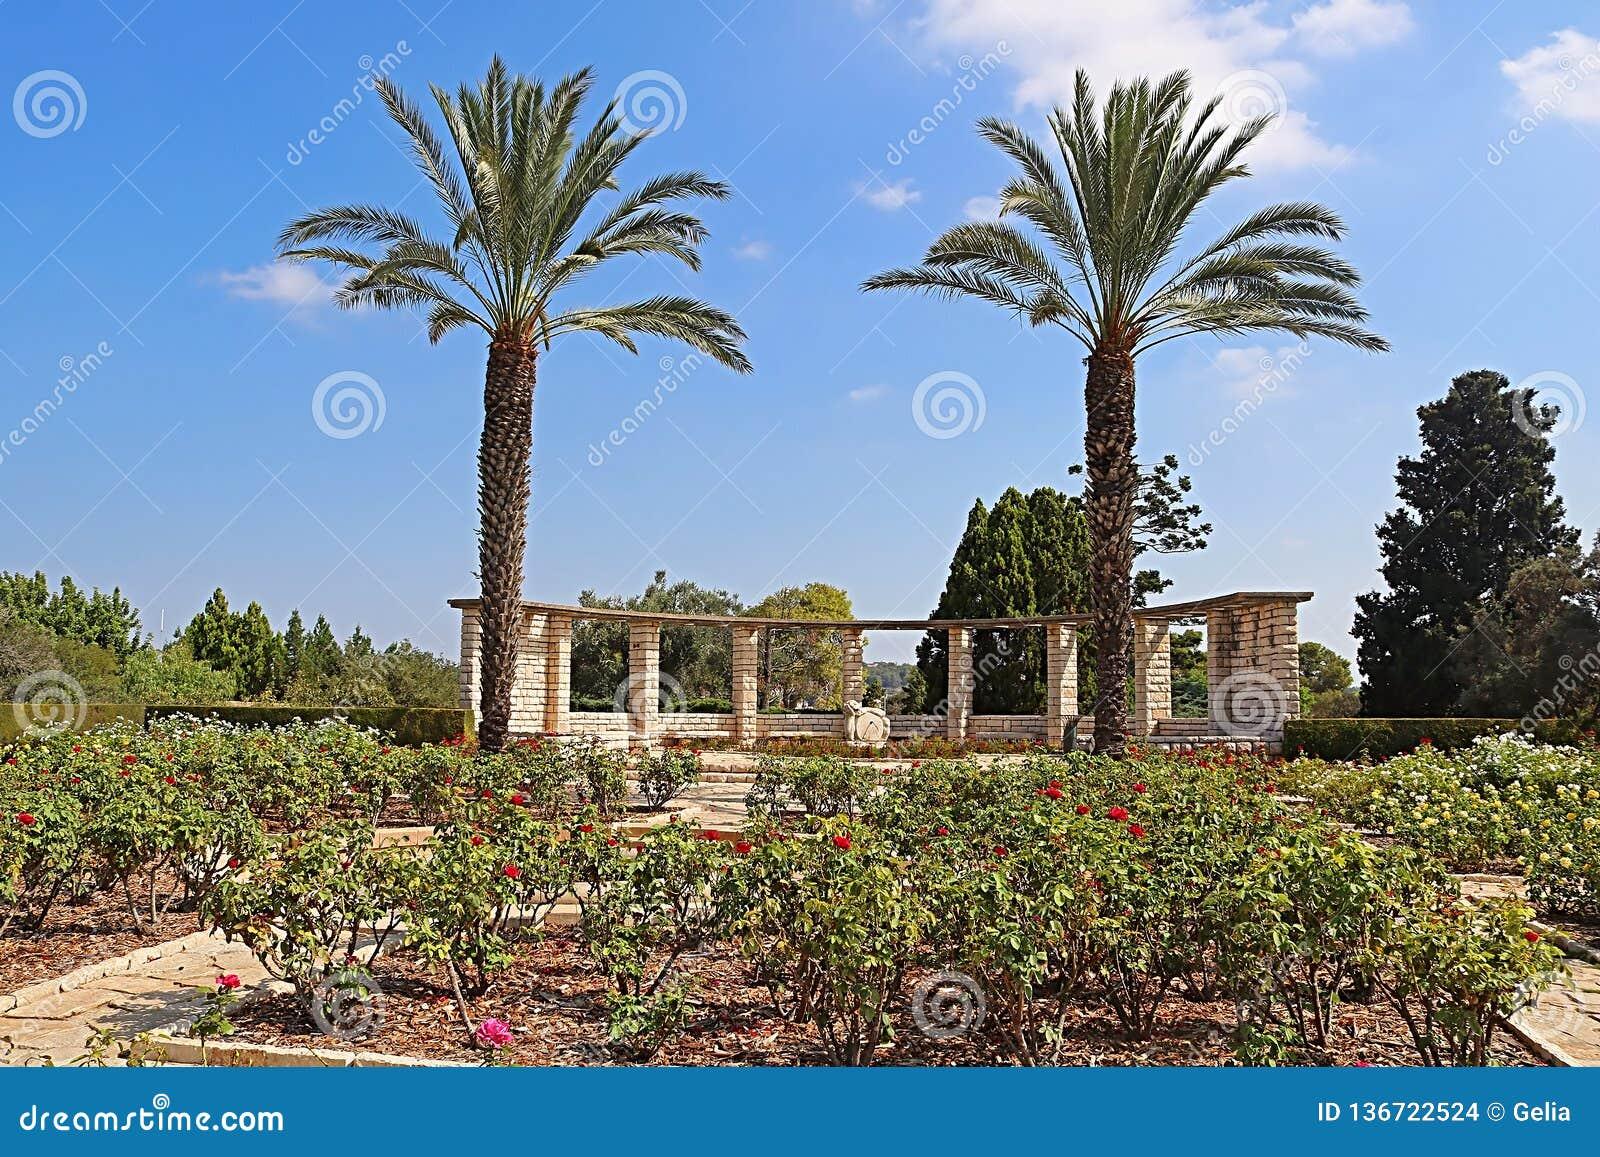 Nam tuin, palmen en zonklok, Park Ramat Hanadiv, Israël toe